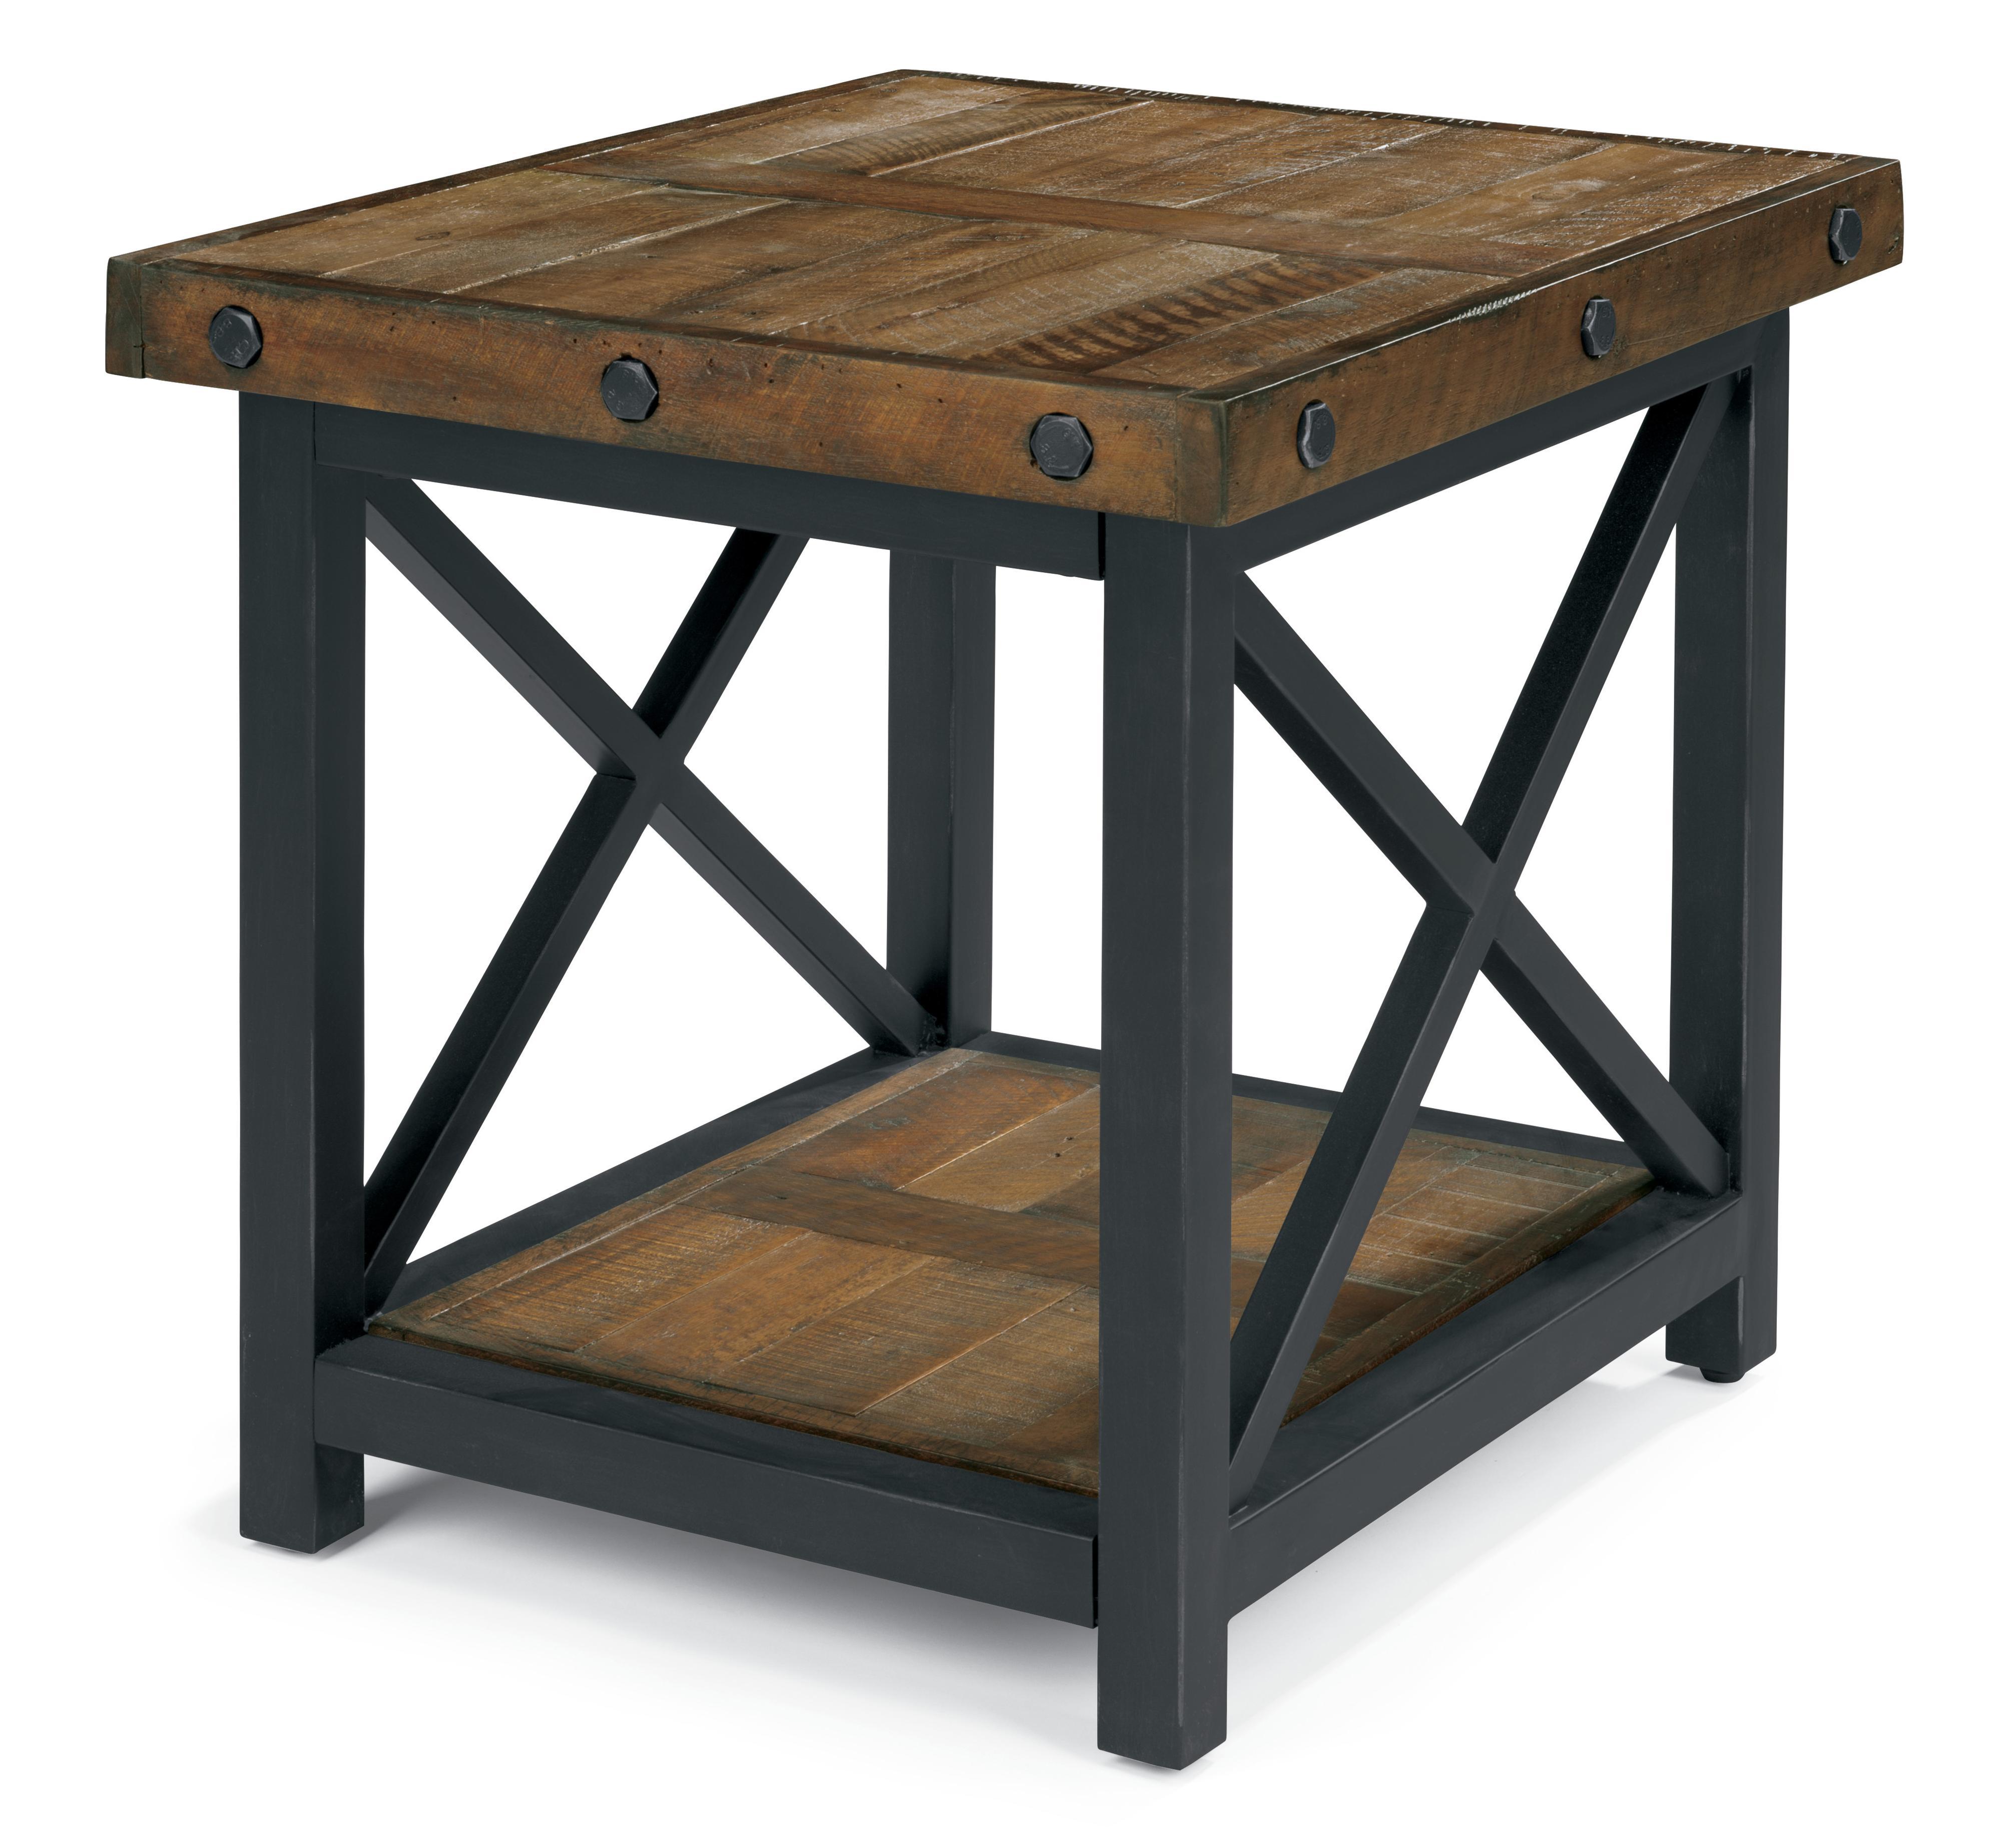 Incroyable Rectangle End Table With Metal Base